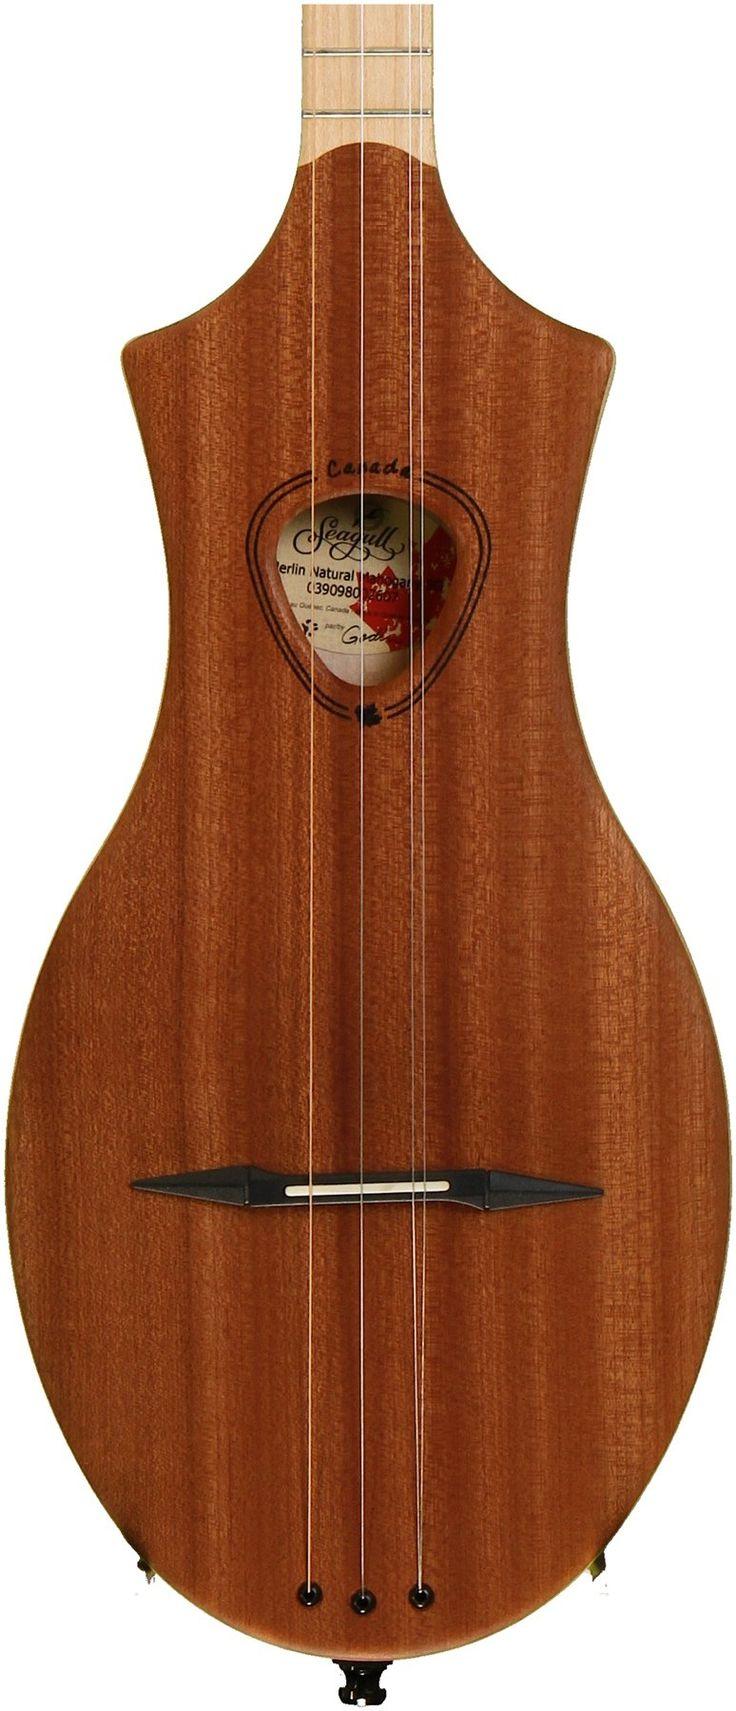 Seagull Guitars Merlin Mountain Dulcimer - Mahogany image 1